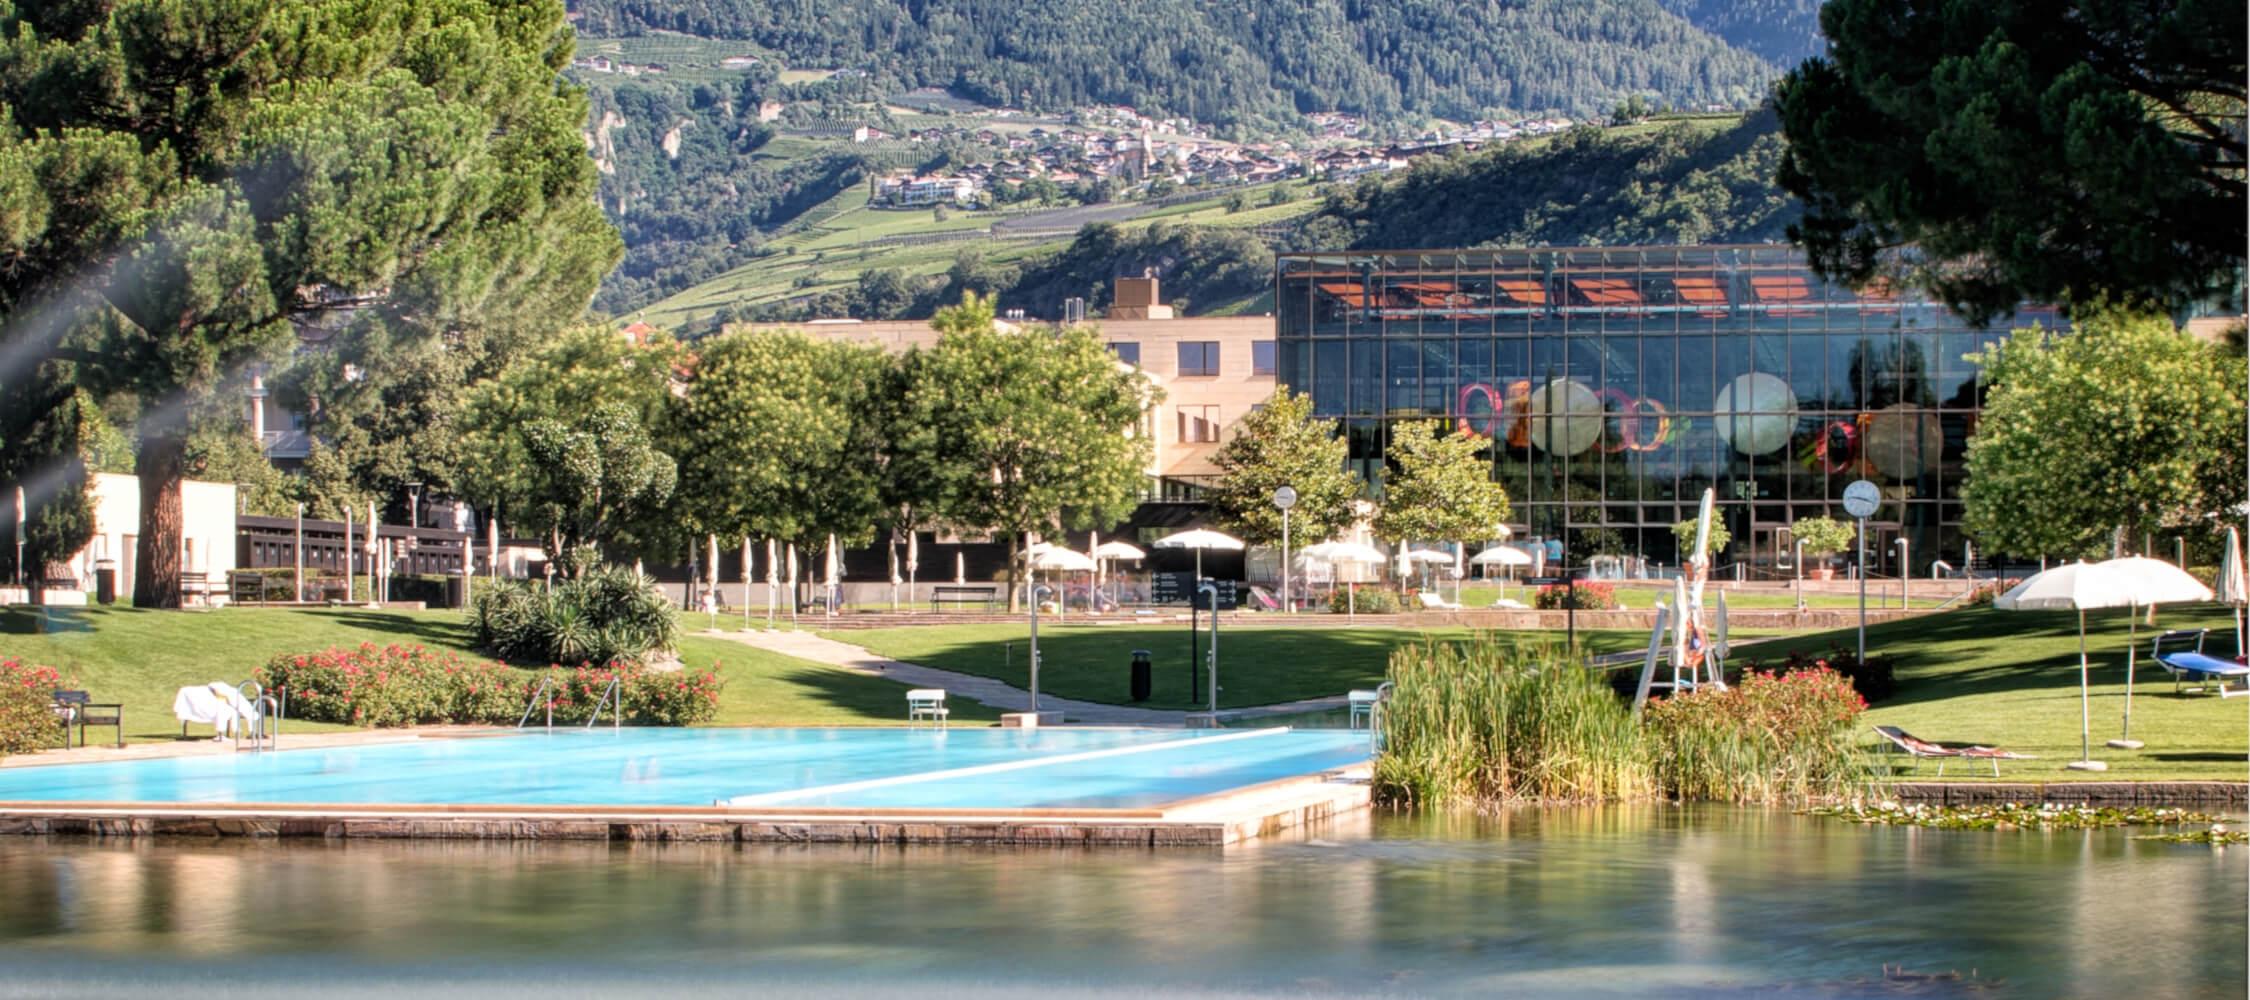 Italien-Trentino_Suedtirol_Alto_Adige_Merano_Meran_Therme_Pool_Aussen_Park_Wasser_8_AlfredTschager_2250x1000